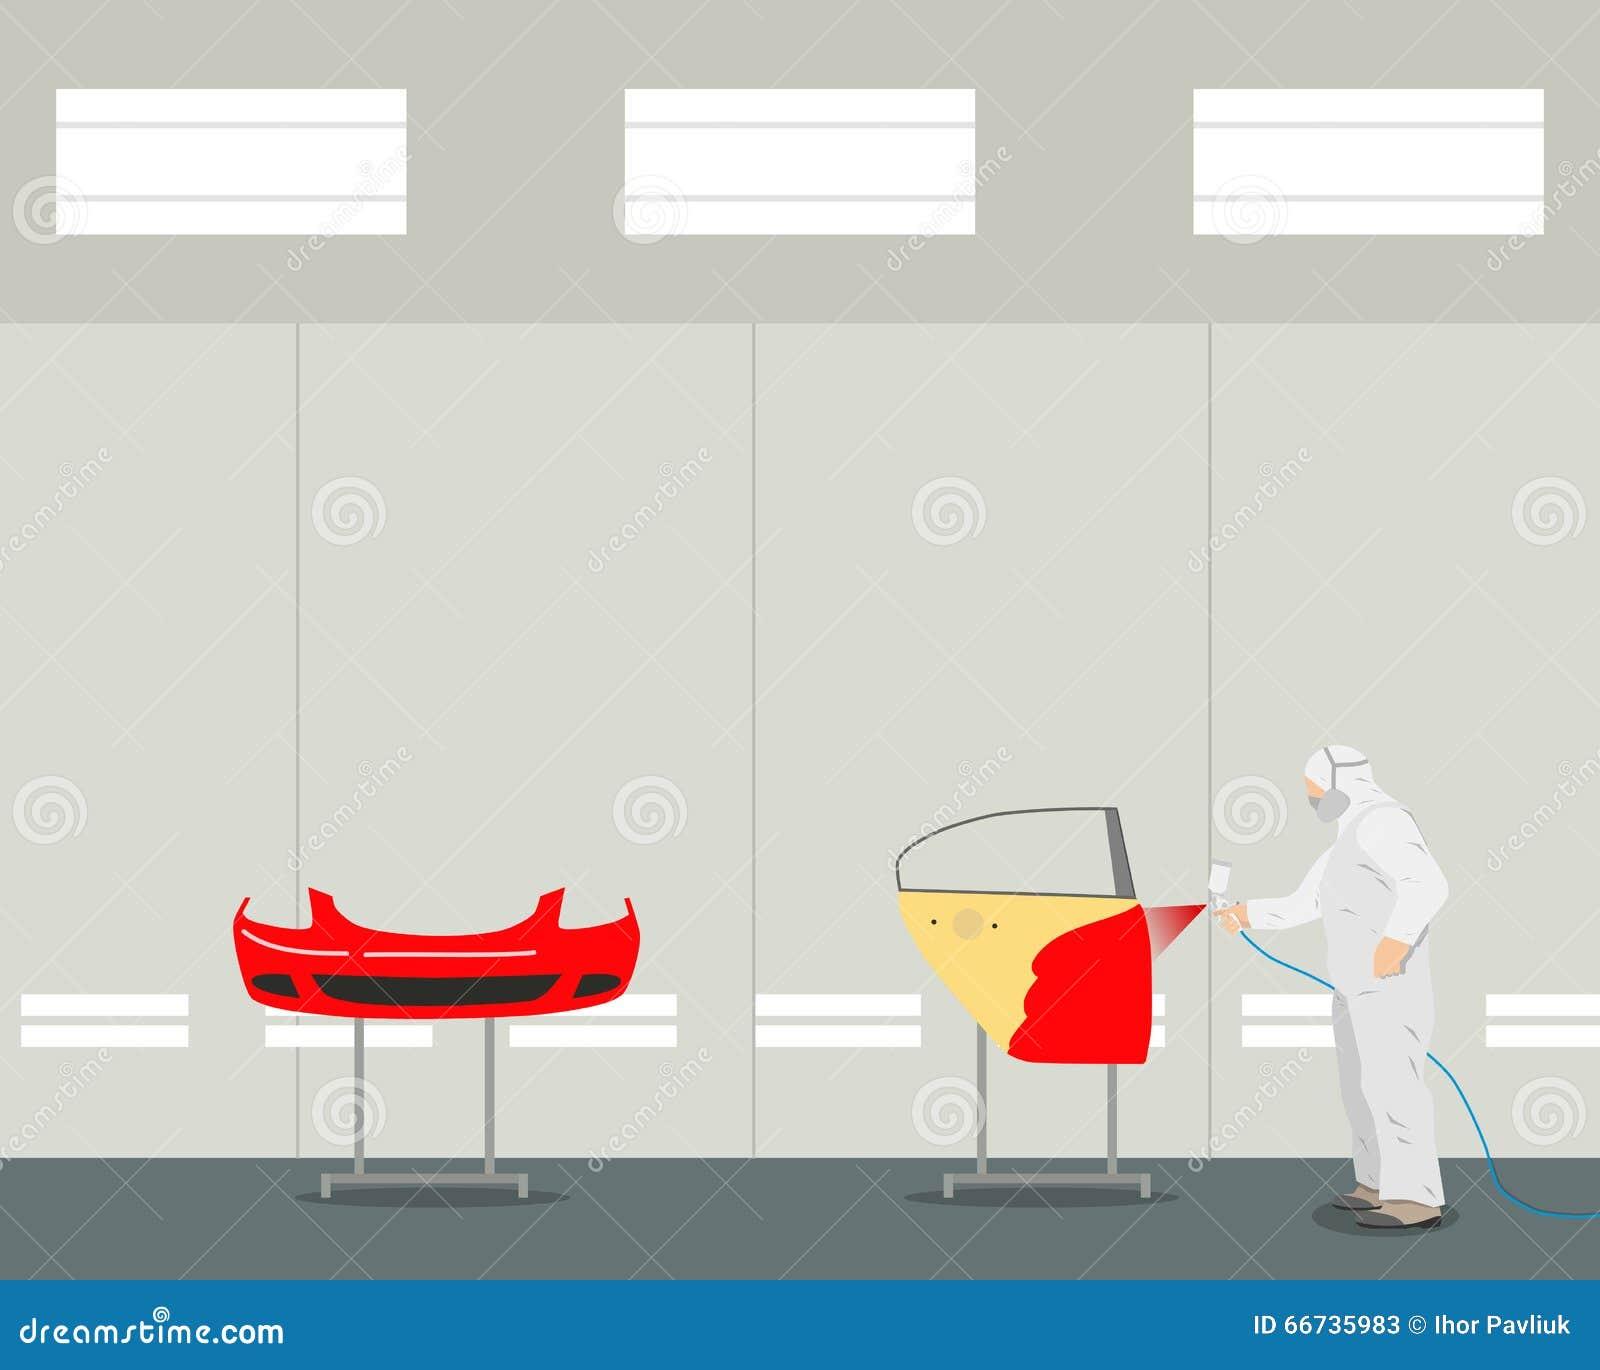 painting details stock vector illustration of interior 66735983. Black Bedroom Furniture Sets. Home Design Ideas